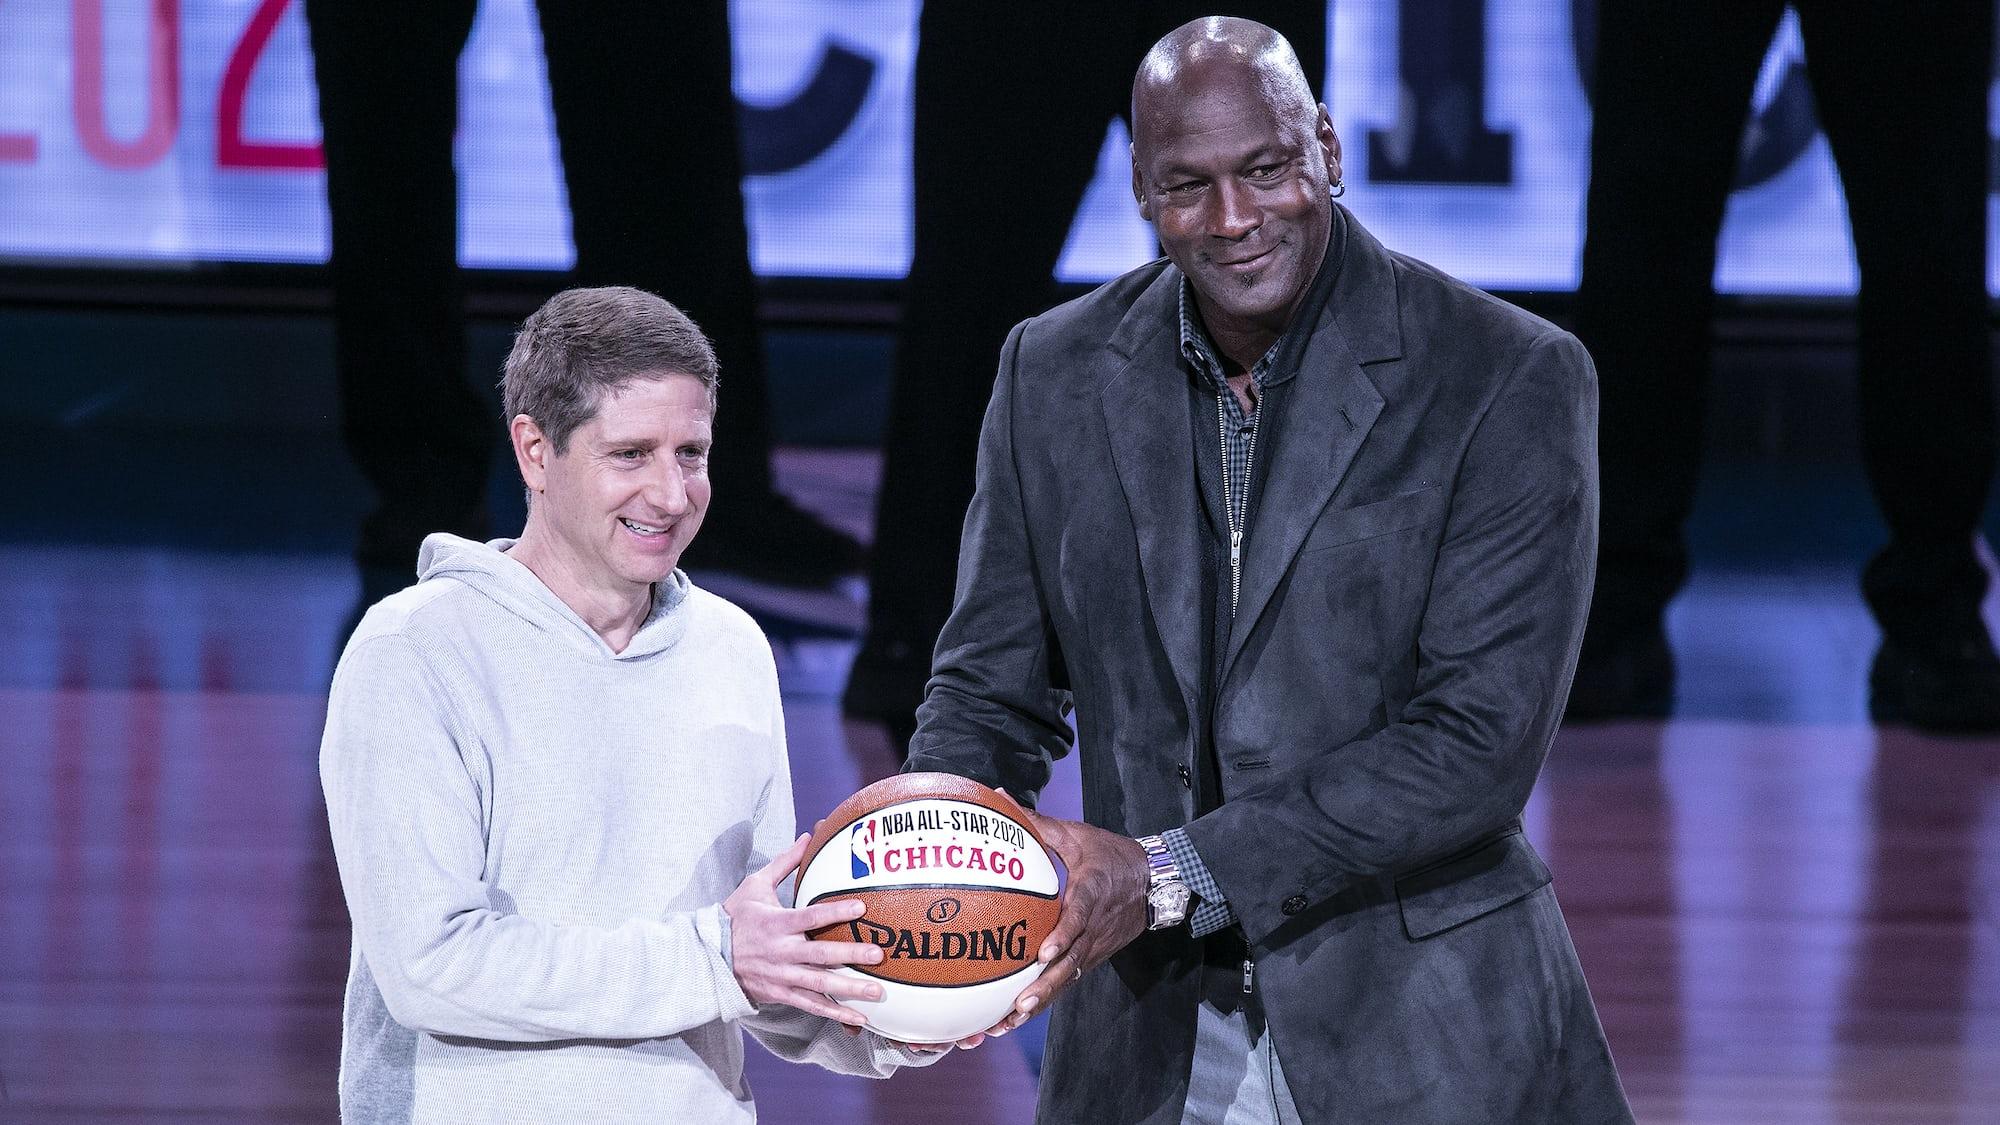 Watch Spotting: Michael Jordan Wearing An Urwerk UR-202S At The NBA All-Star Game